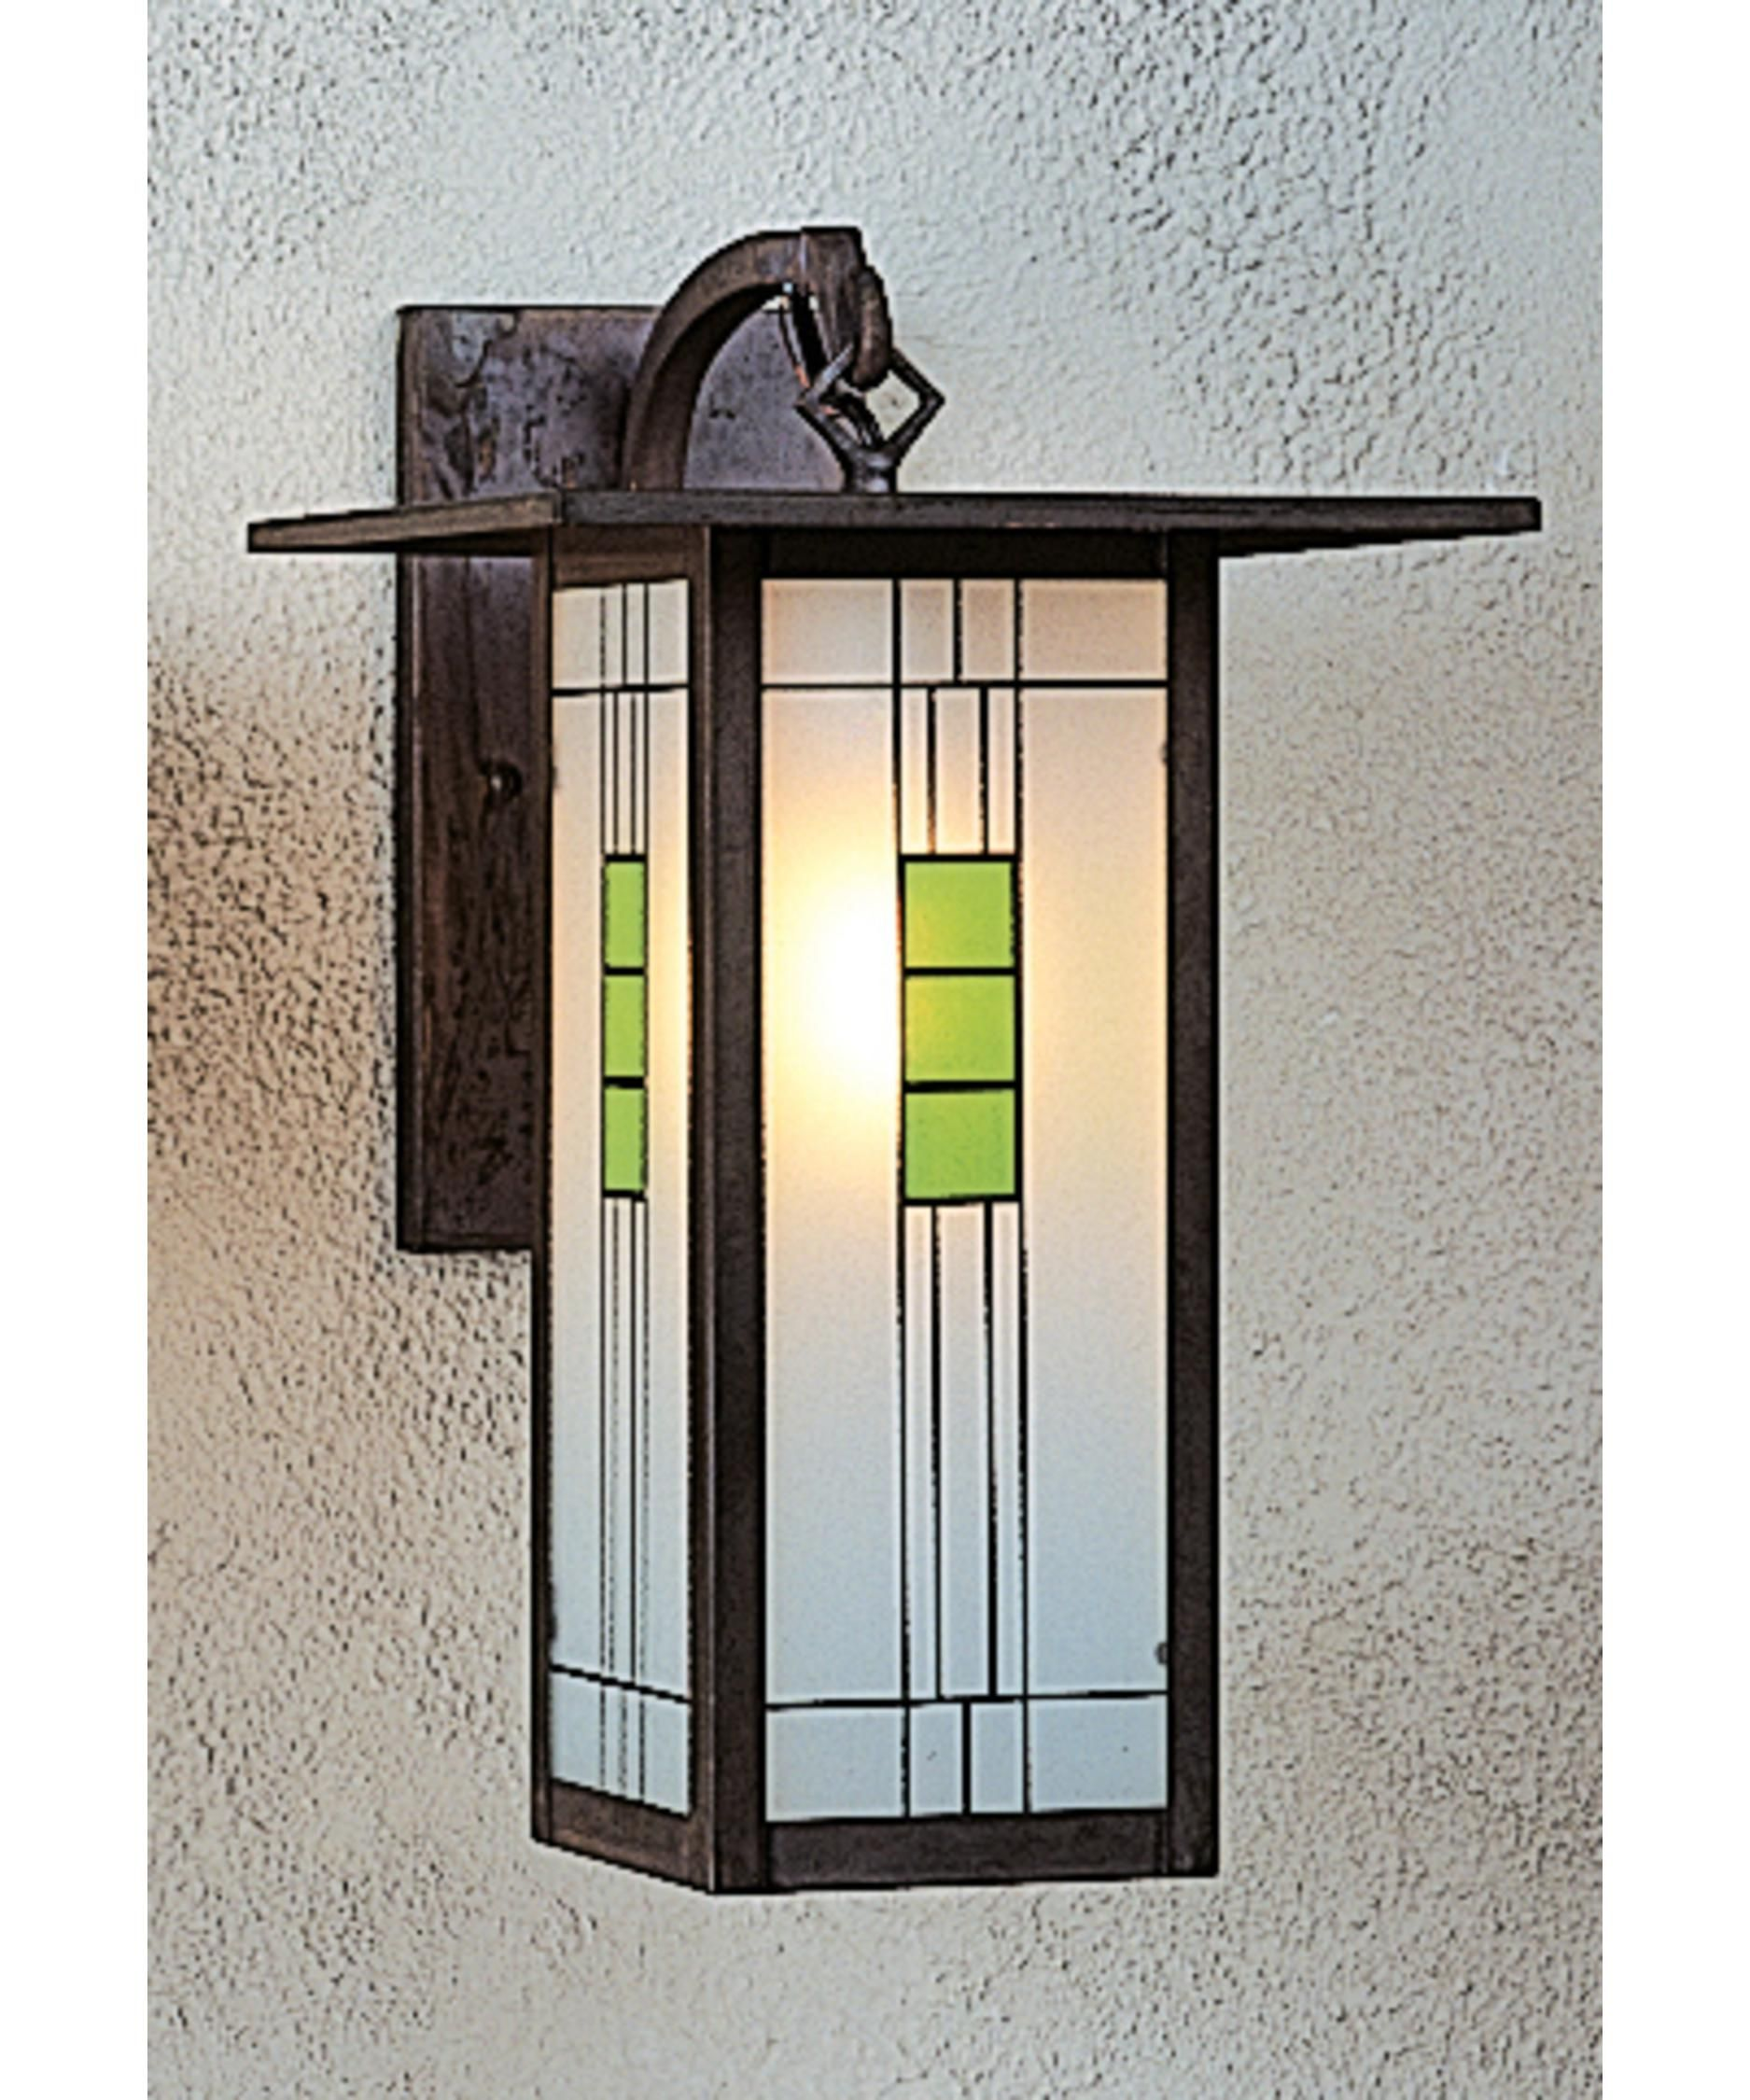 Franklin 15 Inch Tall 1 Light Outdoor Wall Light By Arroyo Craftsman Outdoor Wall Lighting Wall Sconces Wall Lights